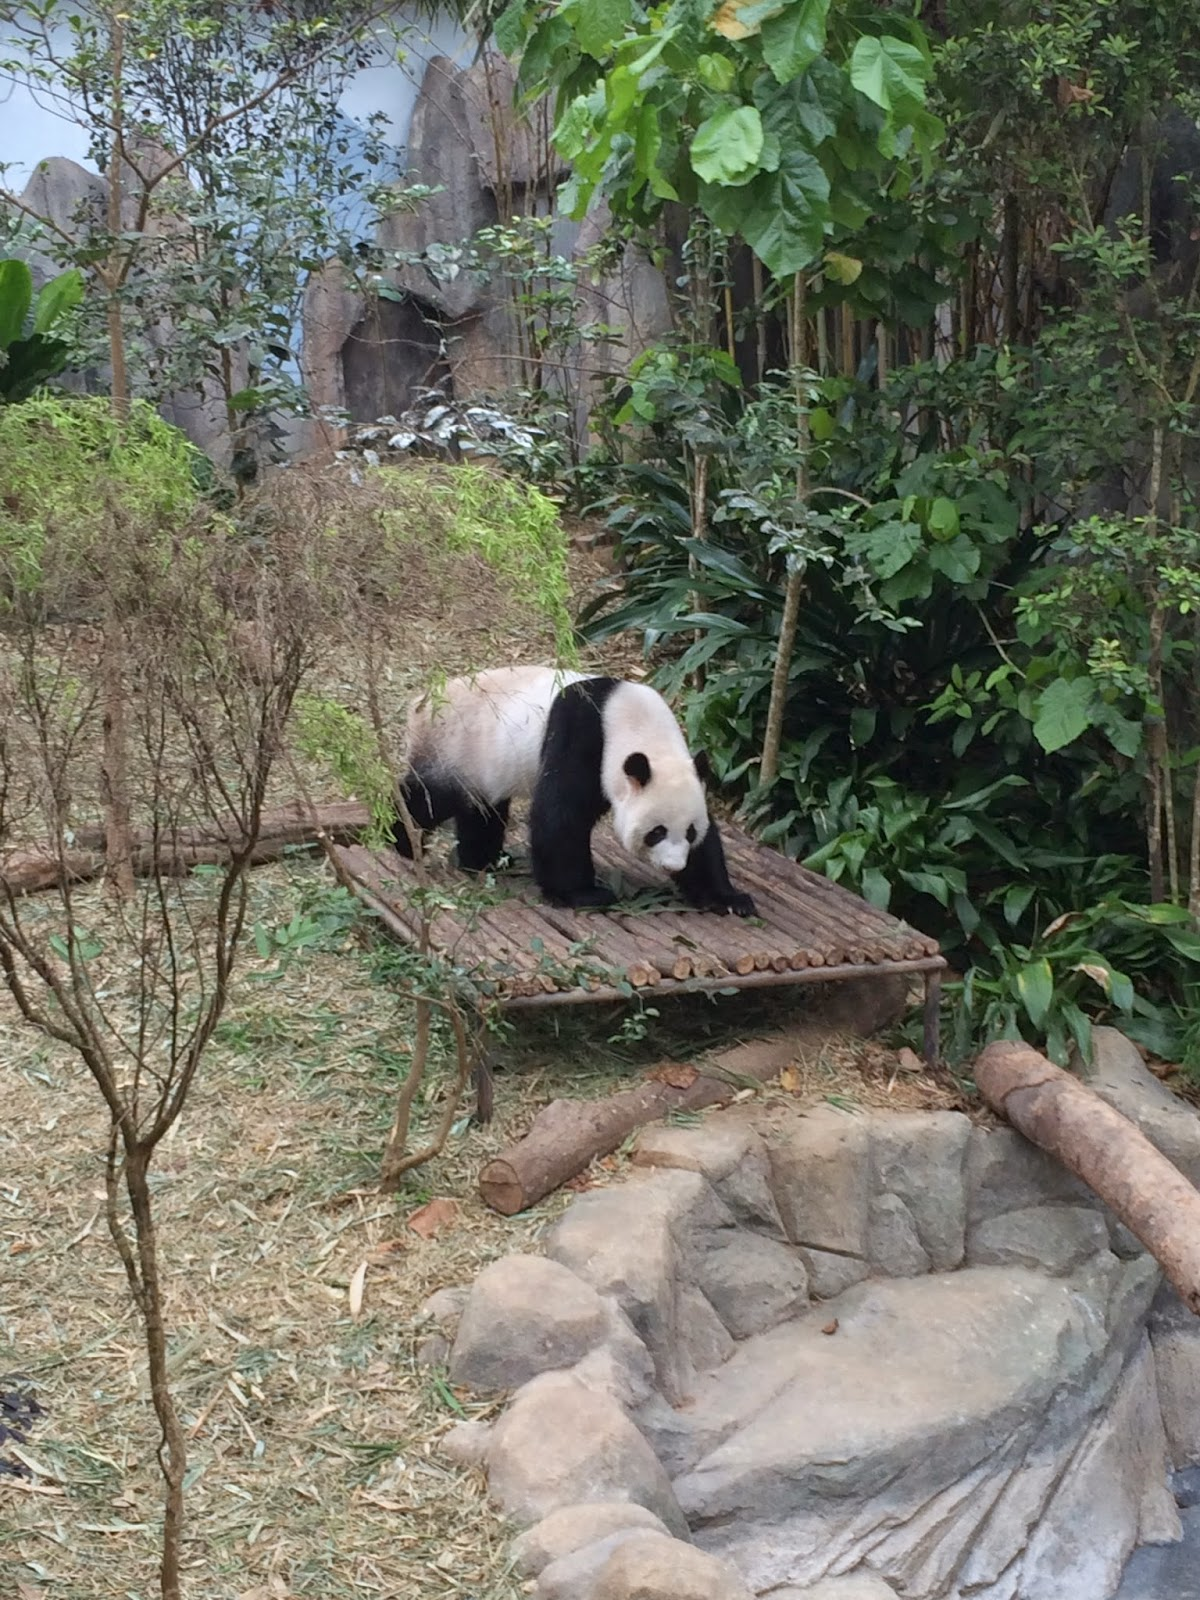 Panda at Singapore Zoo